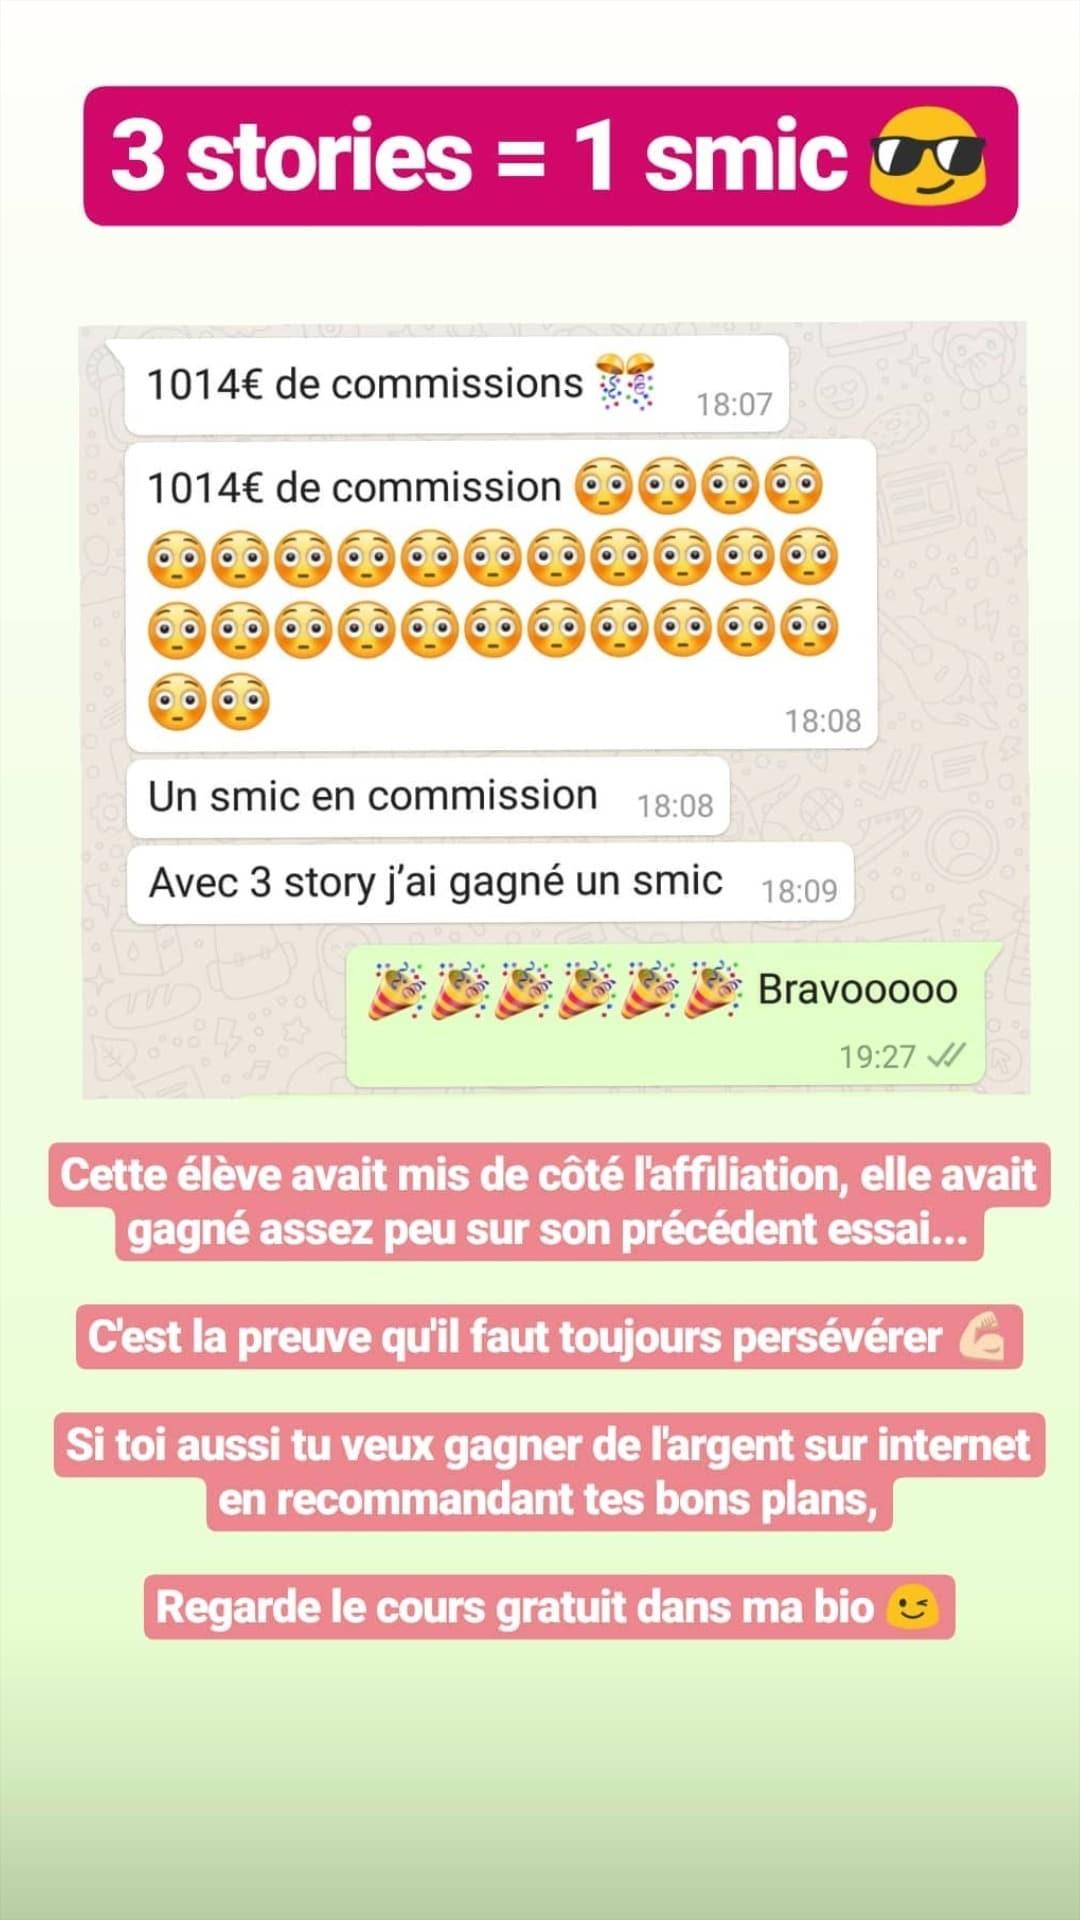 Avis-Les-Reines-Affiliation_20200605_085306